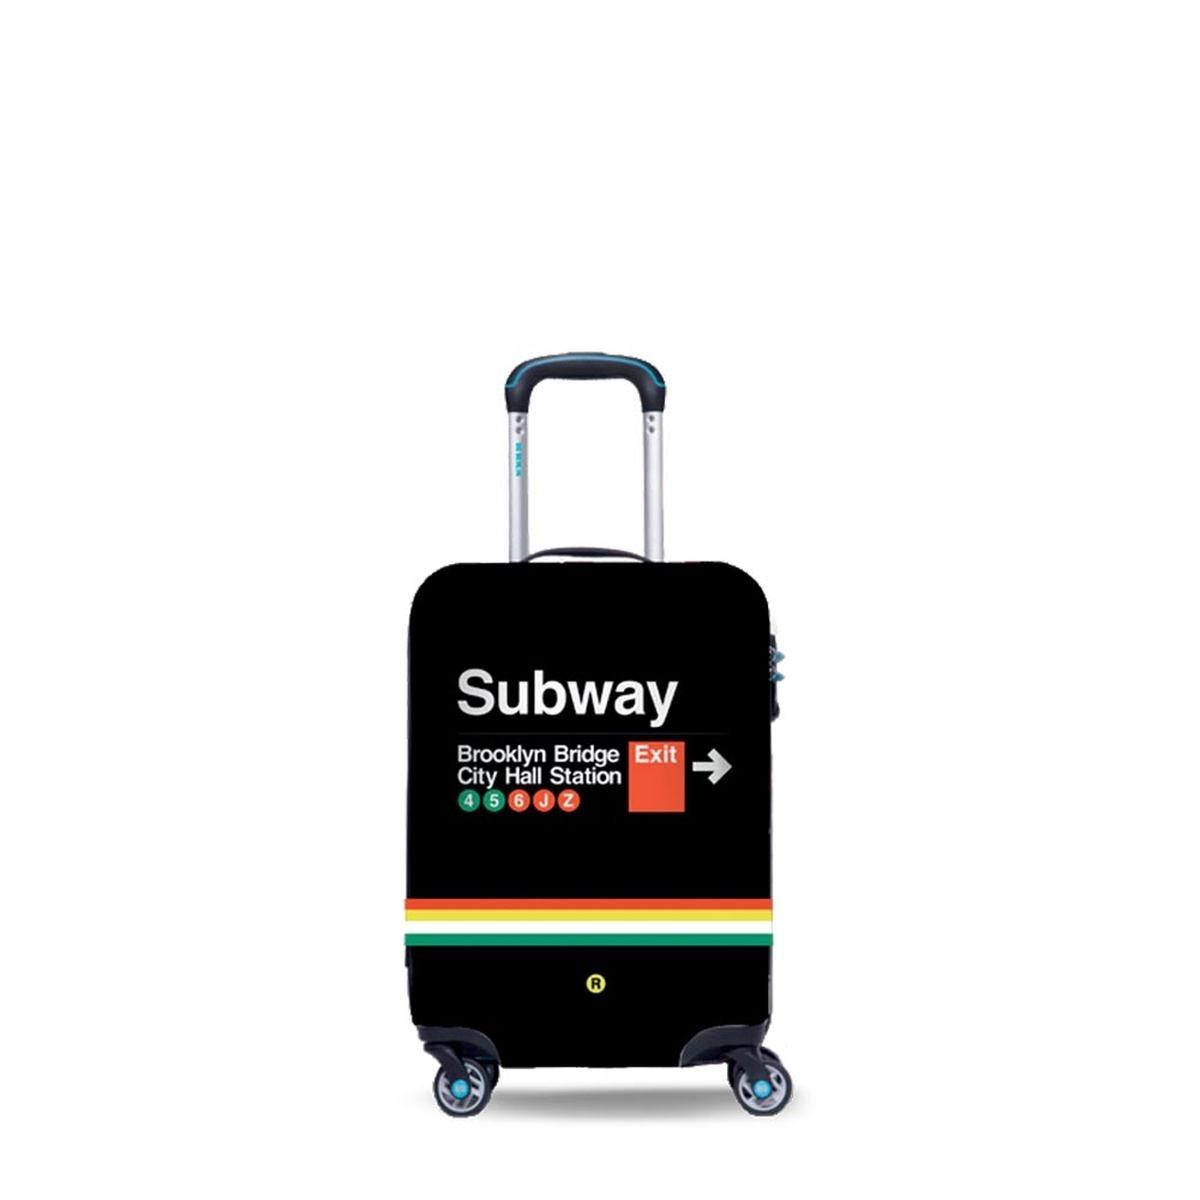 BG Berlin Βαλίτσα trolley καμπίνας 54x35x20 cm Subway Μαύρο